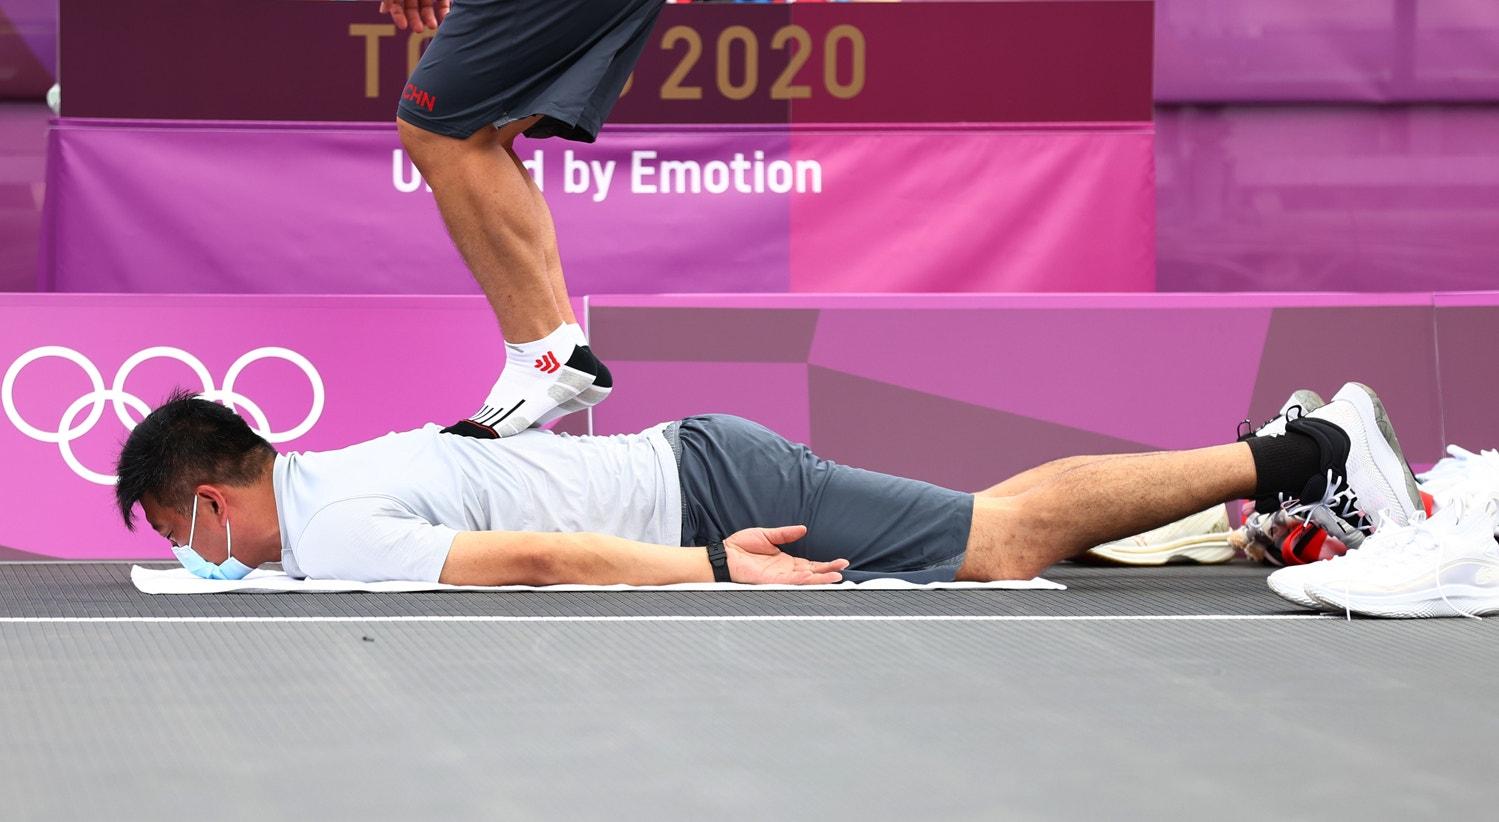 Massagem   Andrew Boyers - Reuters